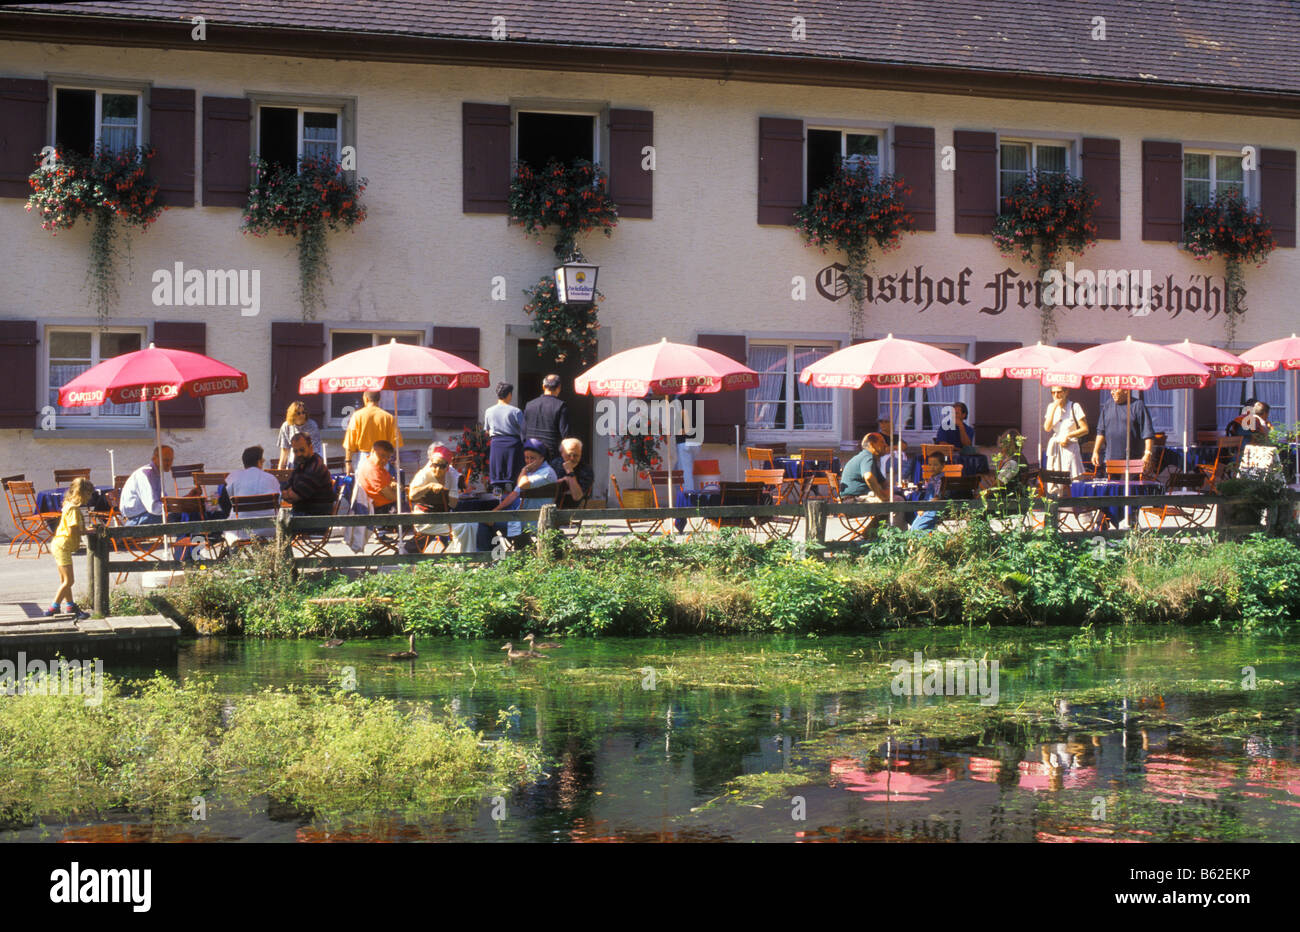 Restaurant Friedrichshoehle, Wimsener Hoehle Cave, near Zwiefalten, Swabian Alb, Baden Wurttemberg, Germany - Stock Image